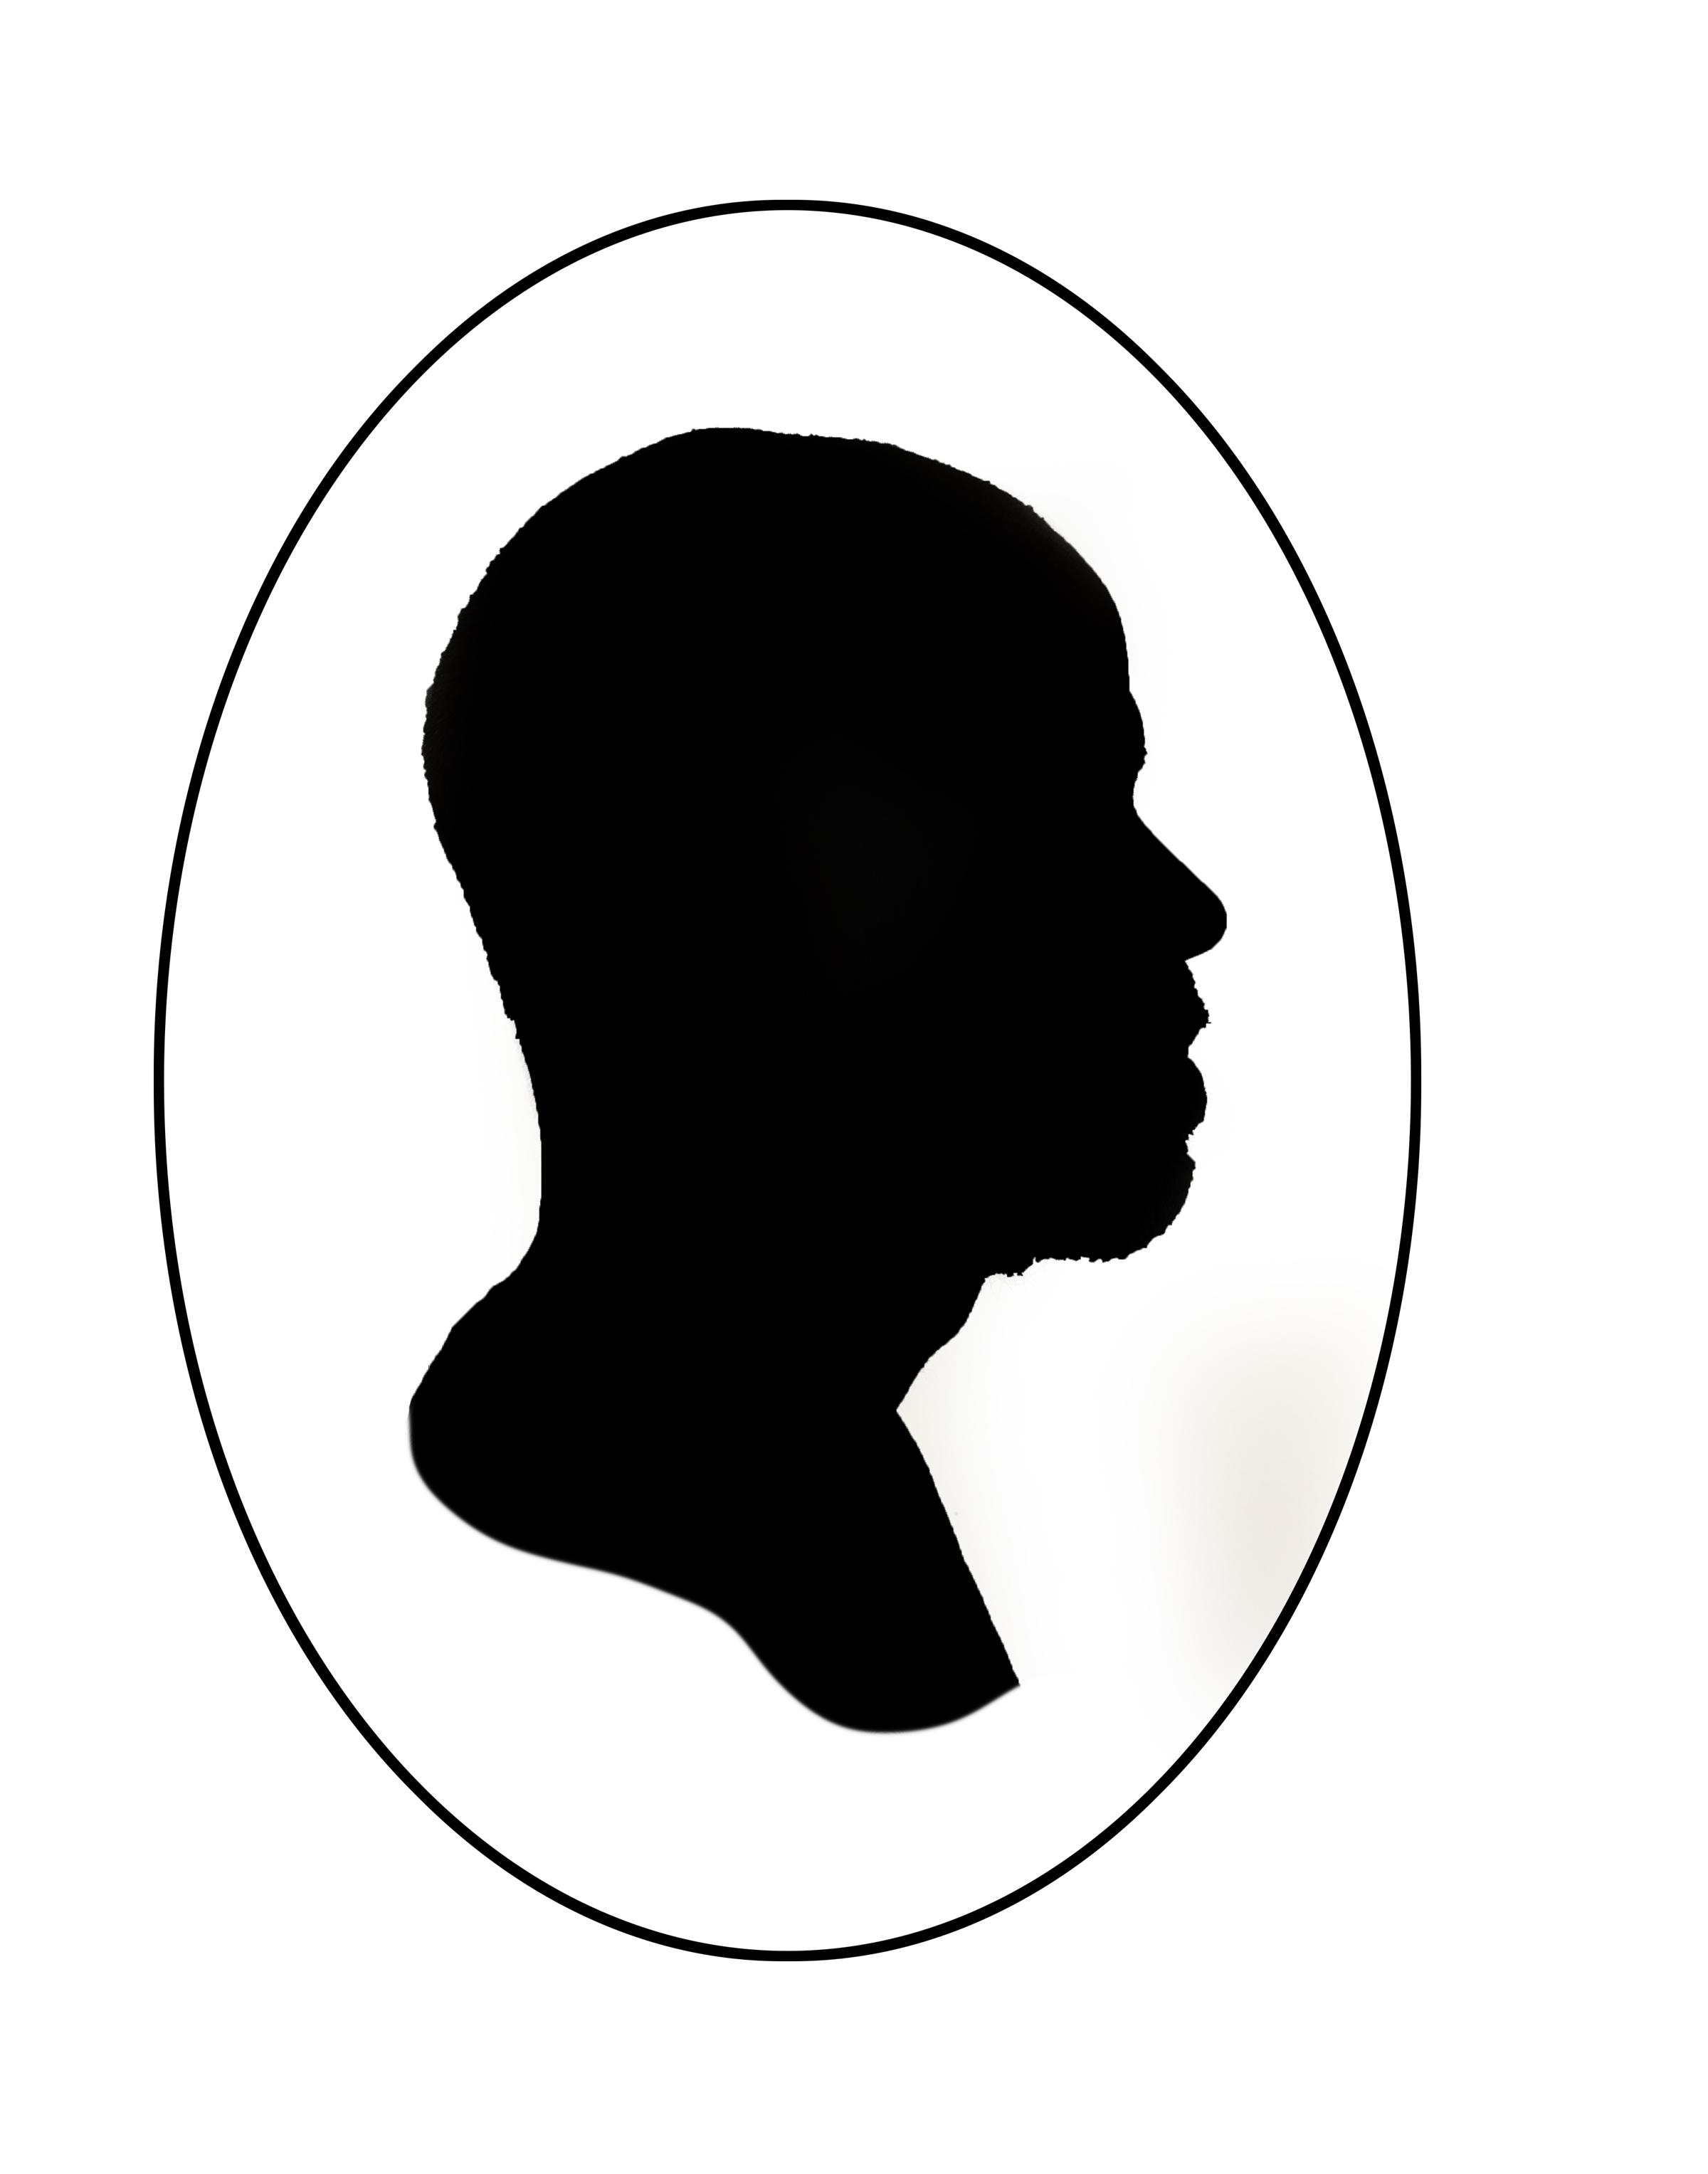 Jordan_silhouette.jpg